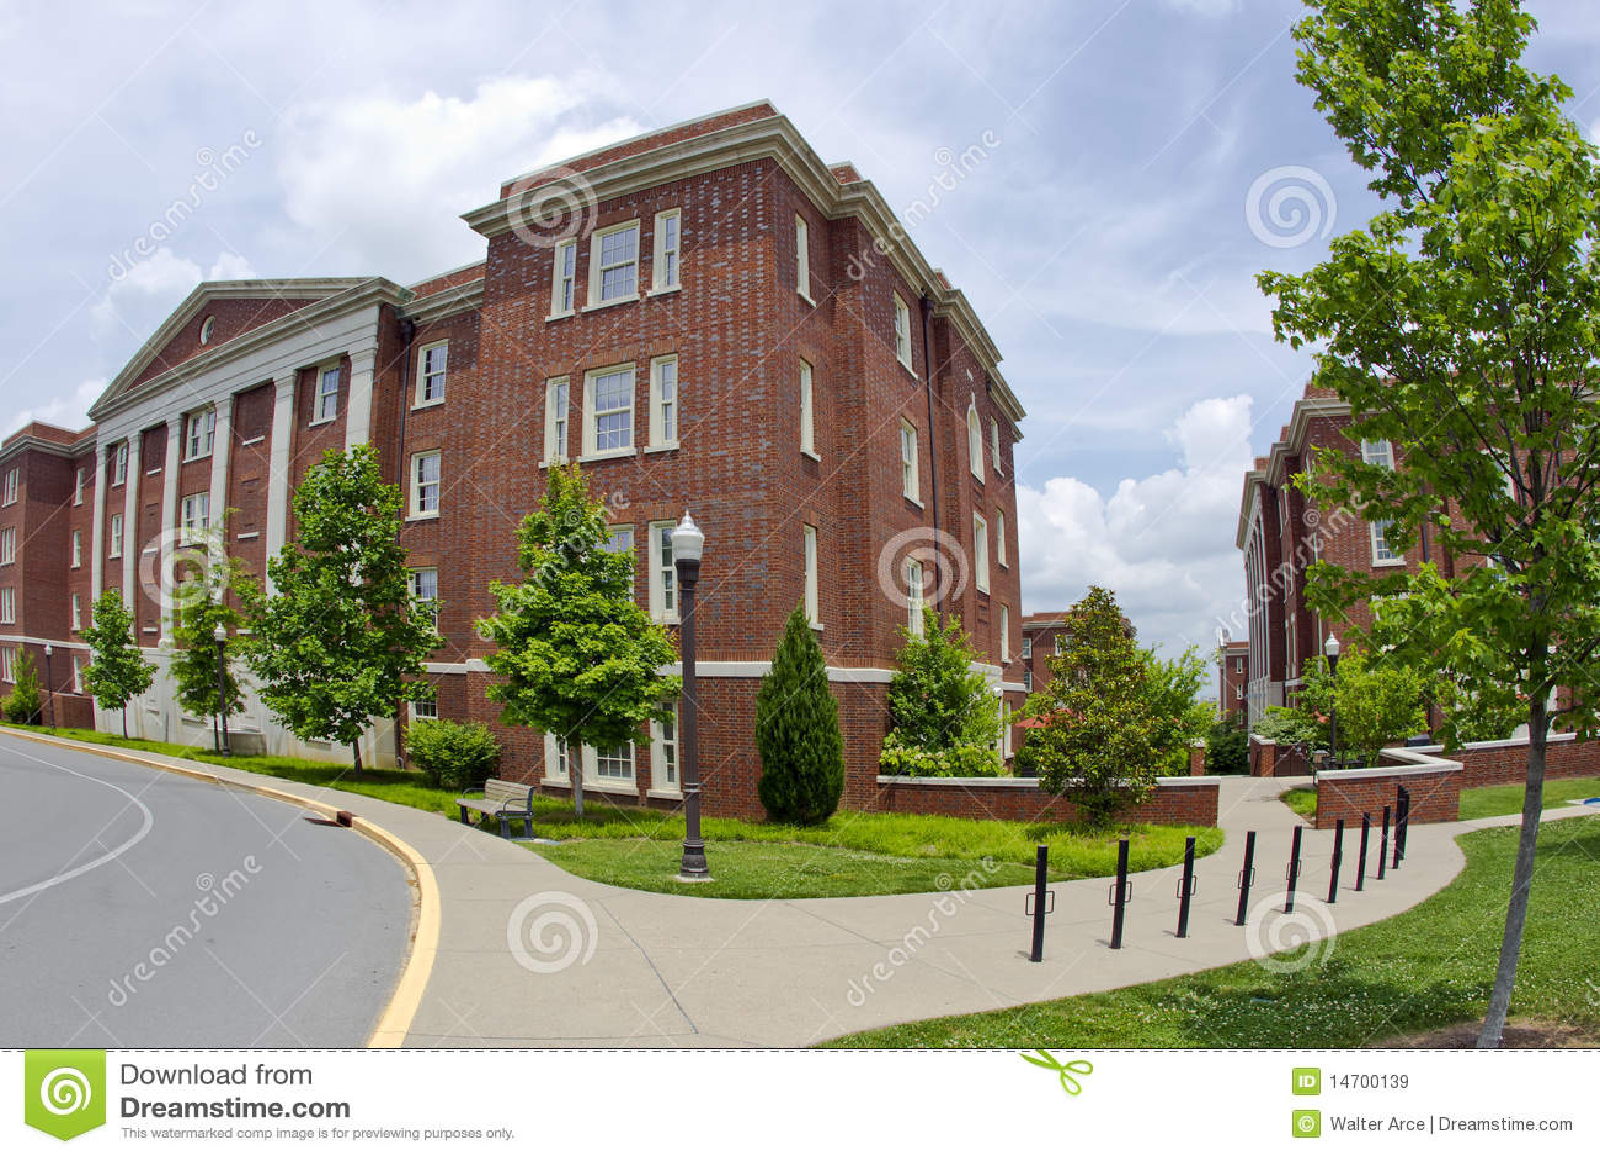 Vanderbilt School Of Nursing >> Vanderbilt University Royalty Free Stock Images - Image ...